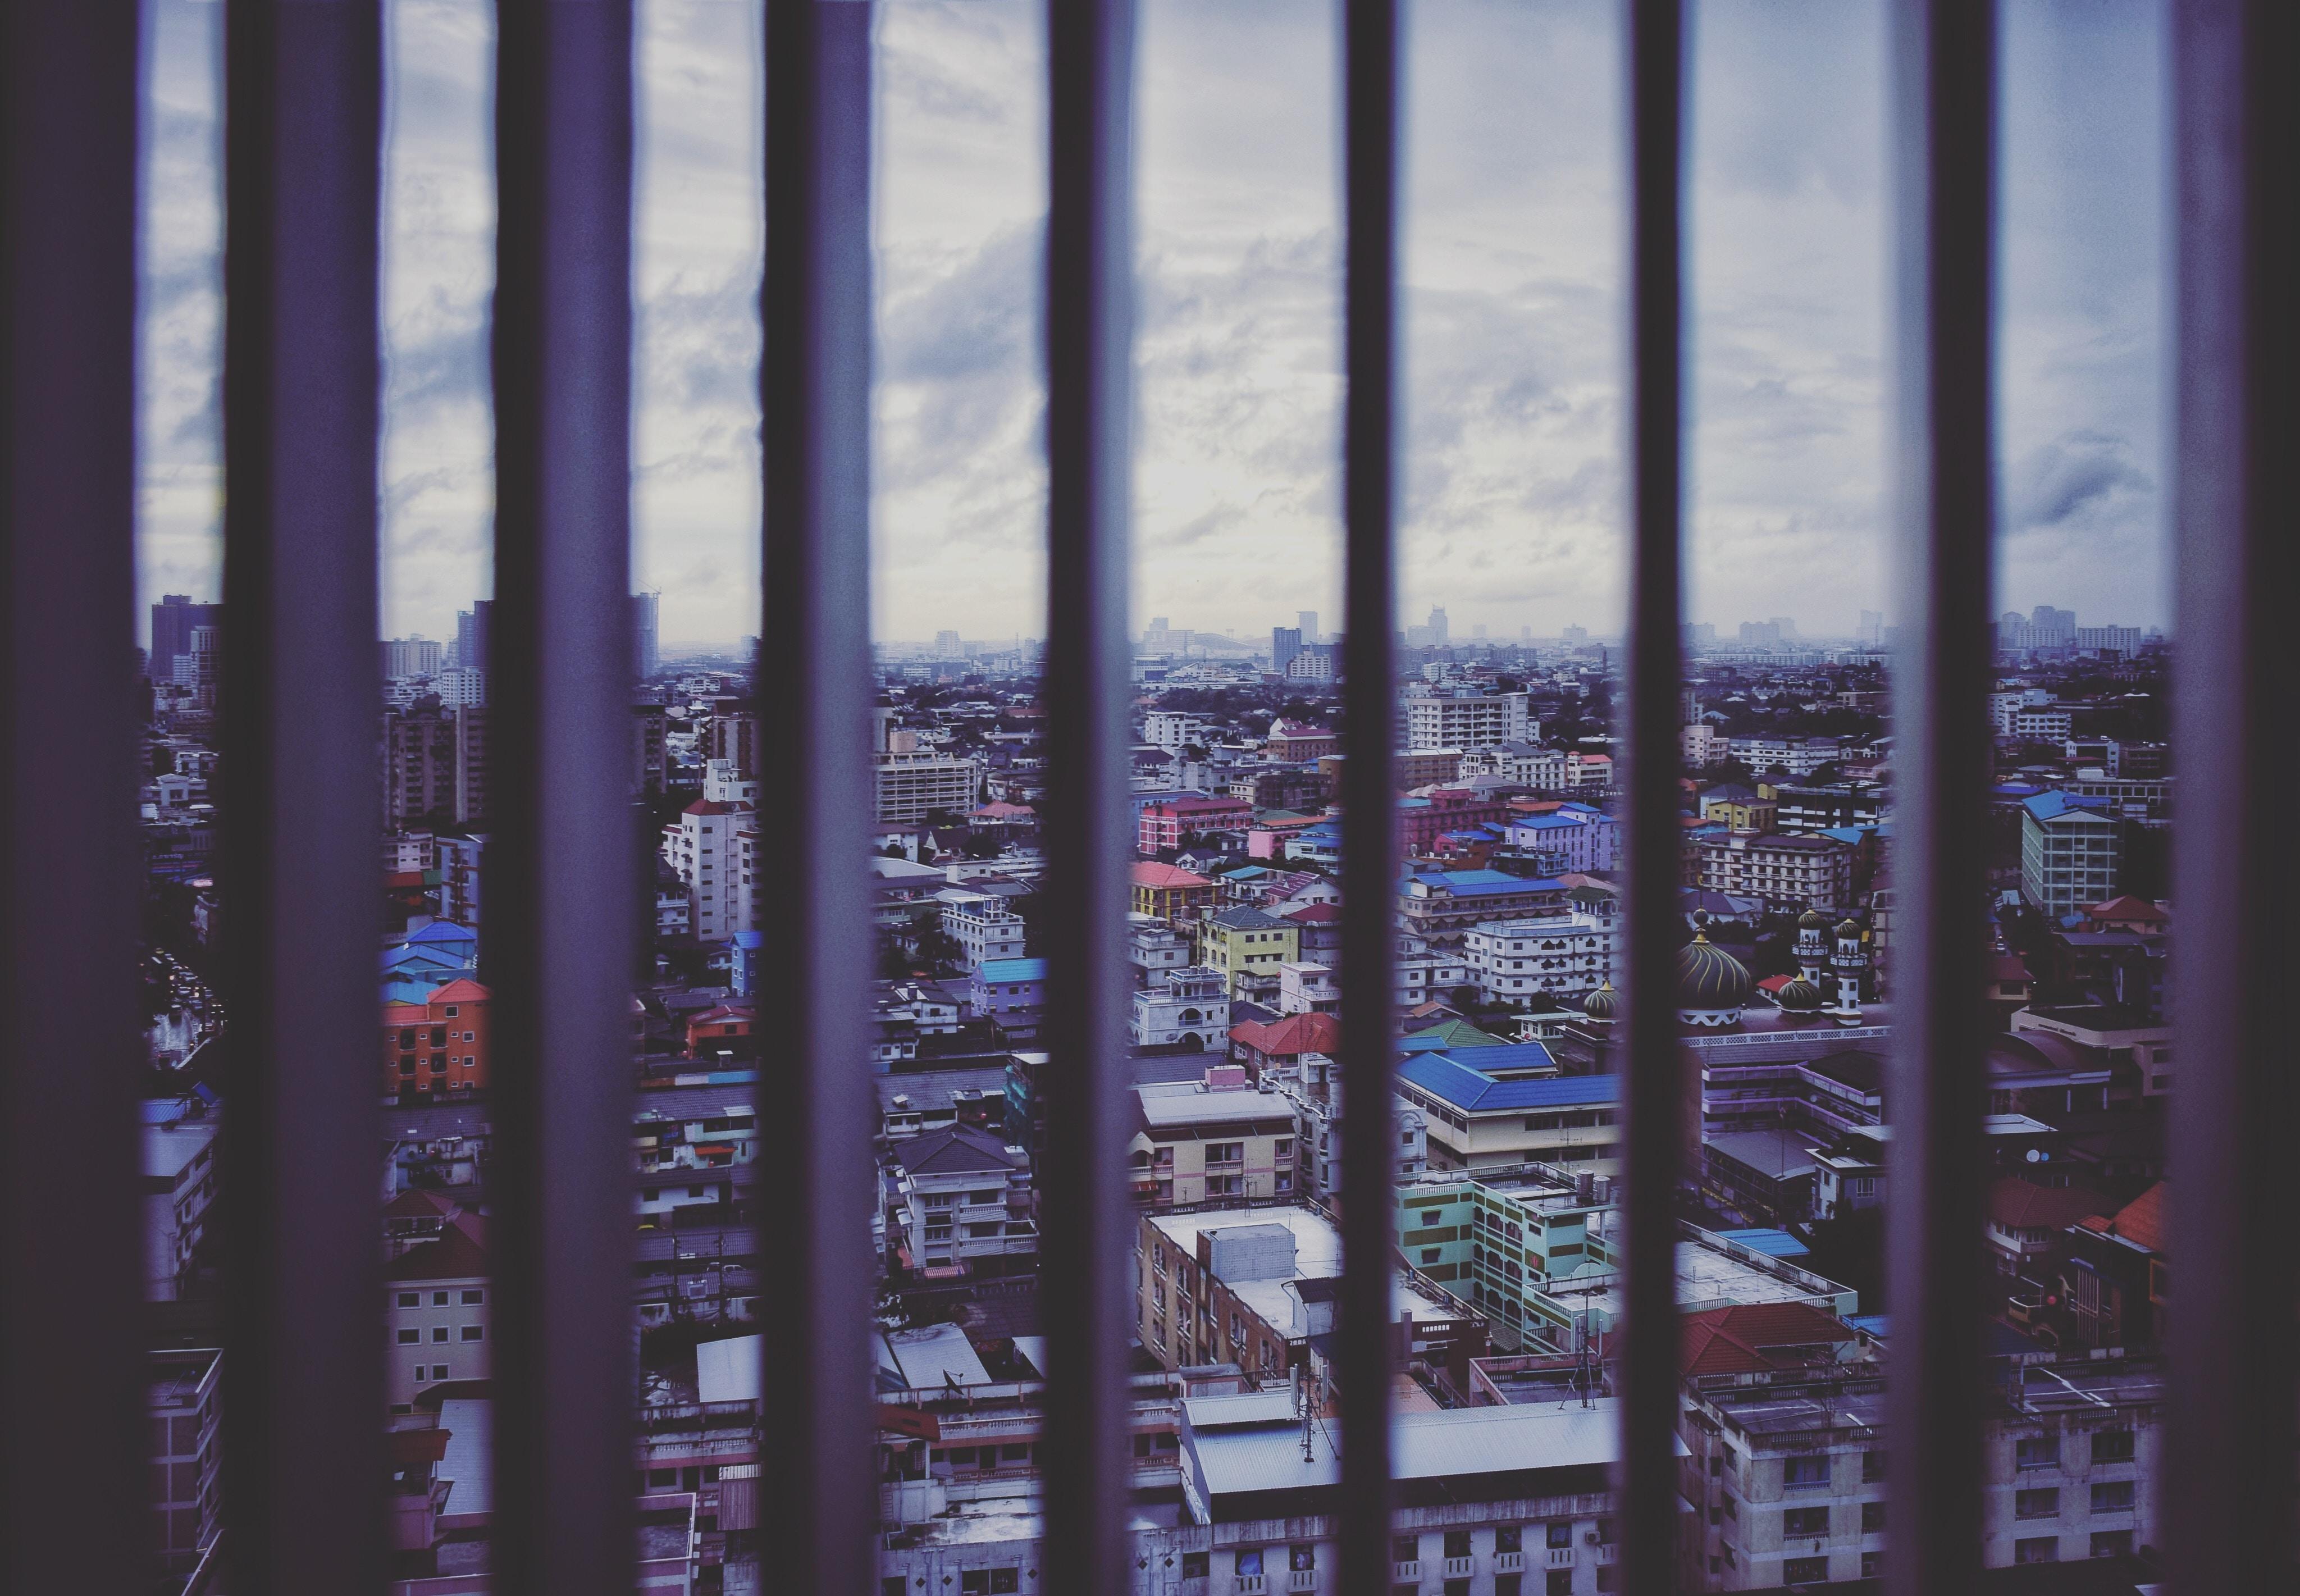 cityscape through black metal rods